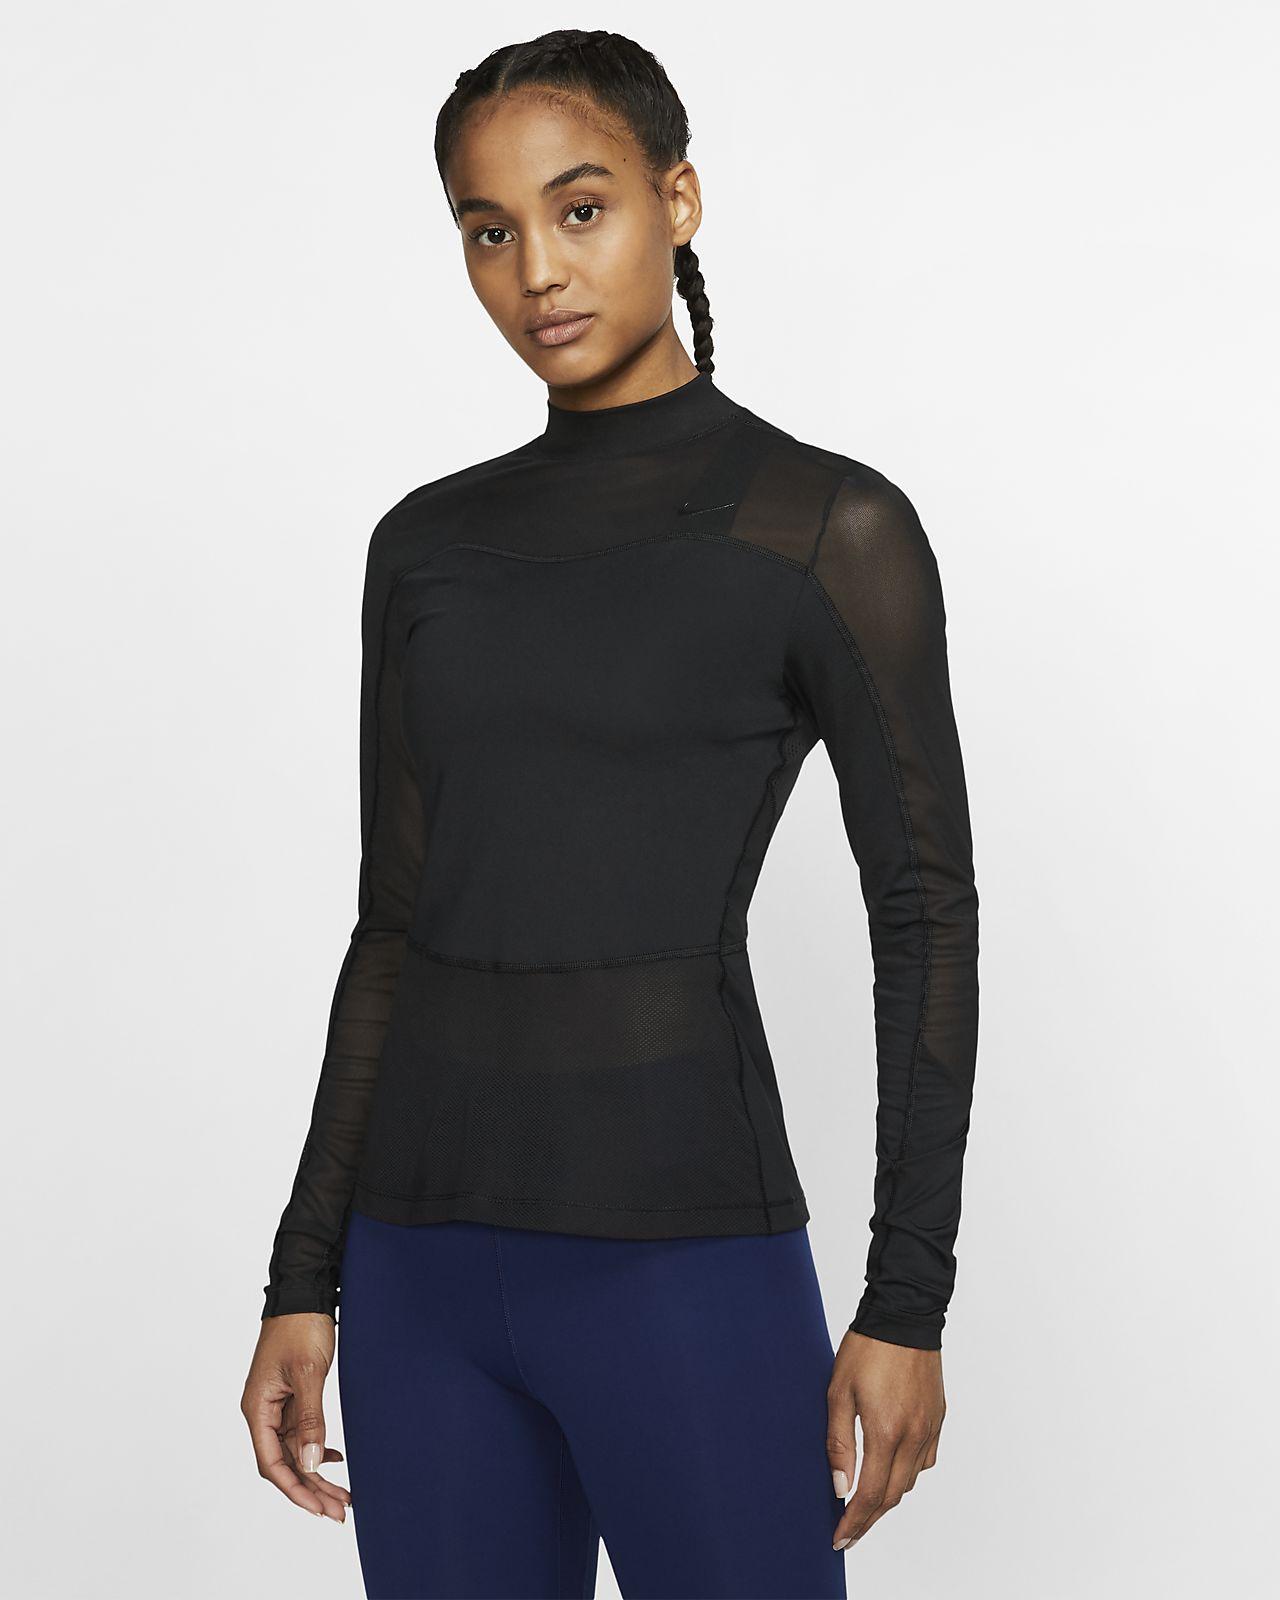 Maglia a manica lunga Nike Pro HyperCool - Donna